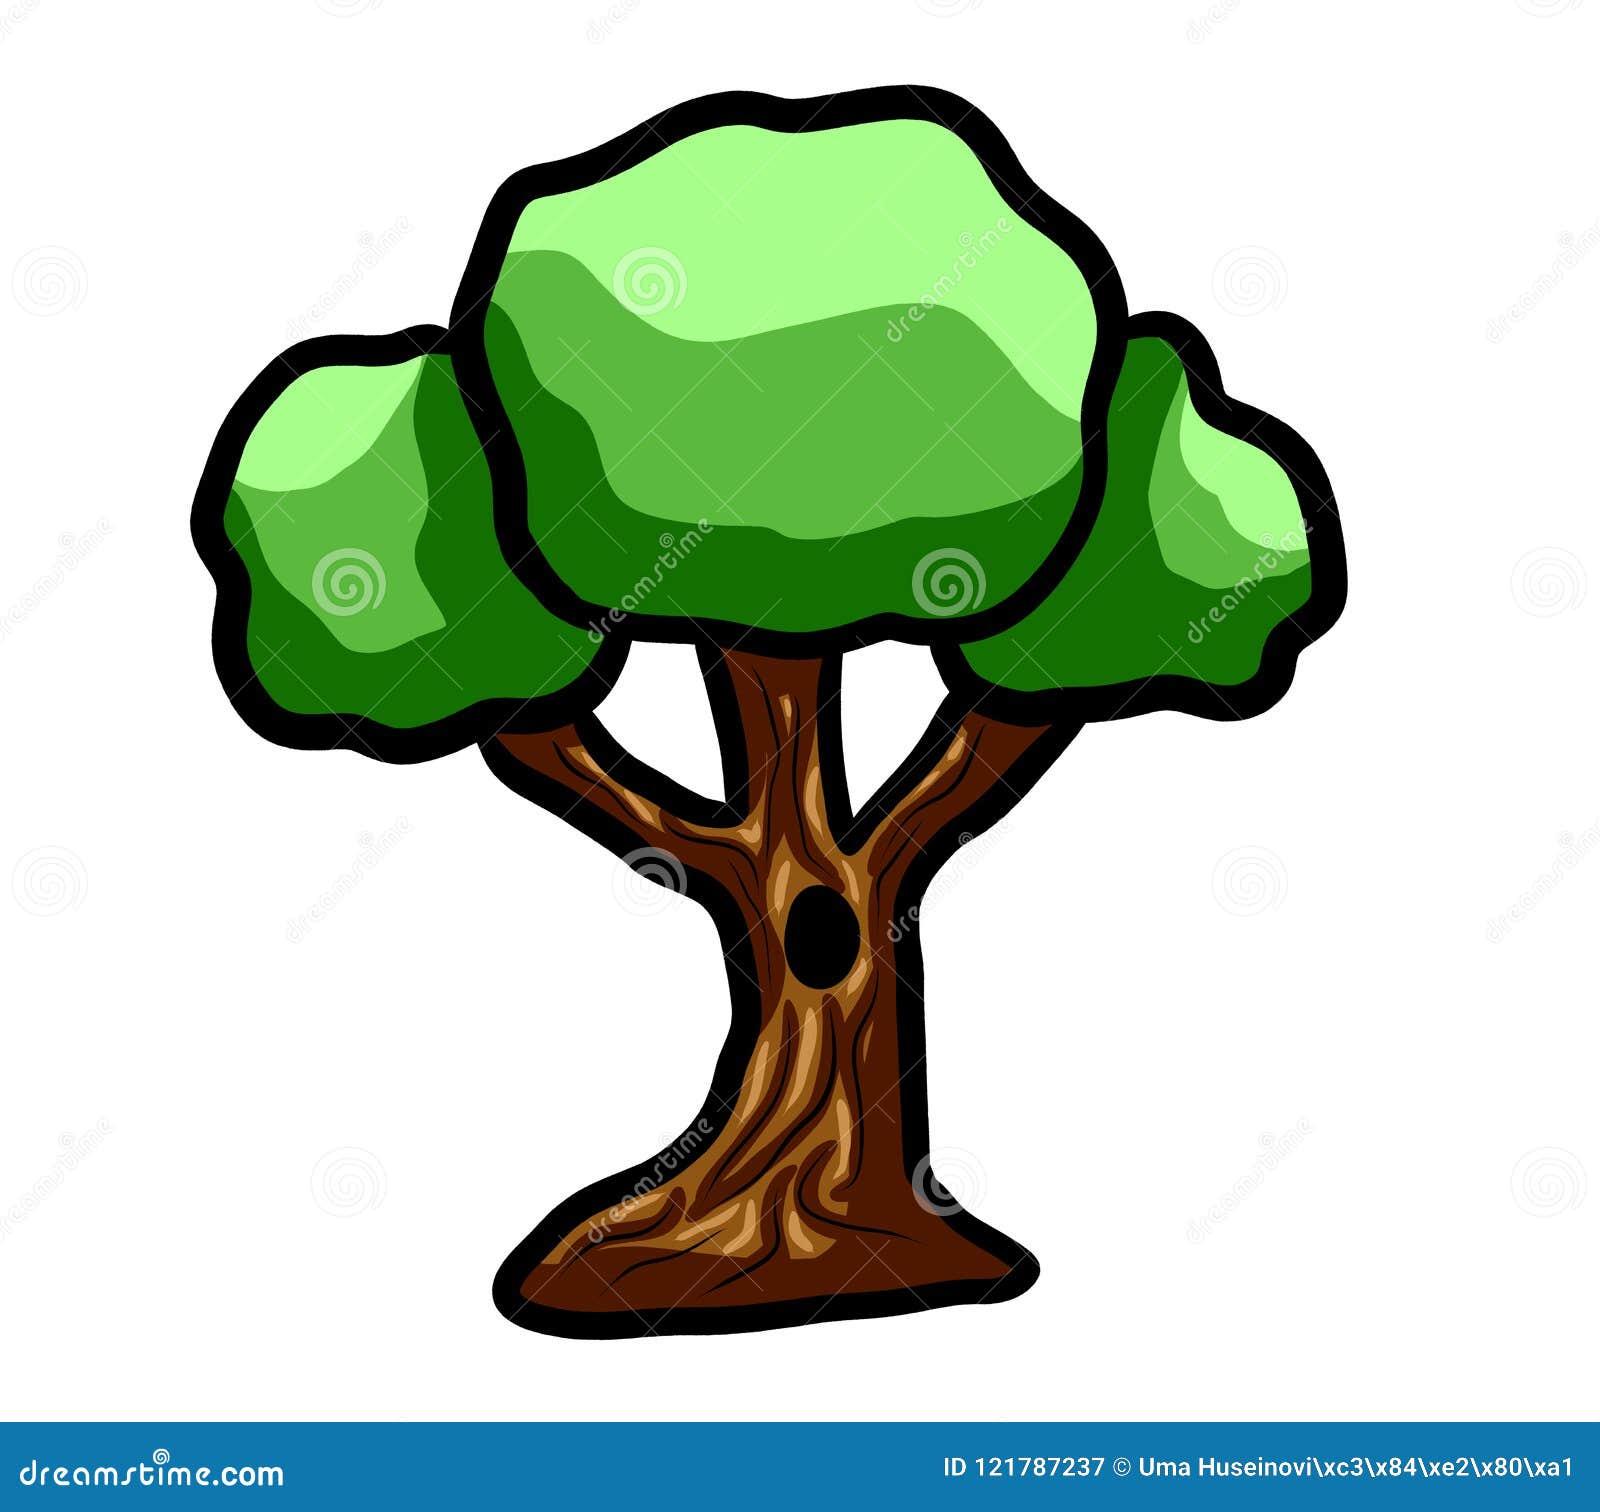 Dark Green Cartoon Fantasy Tree Stock Illustration Illustration Of Flora Clip 121787237 Illustration about cartoon forest trees, bushes, hedges and rocks. dreamstime com